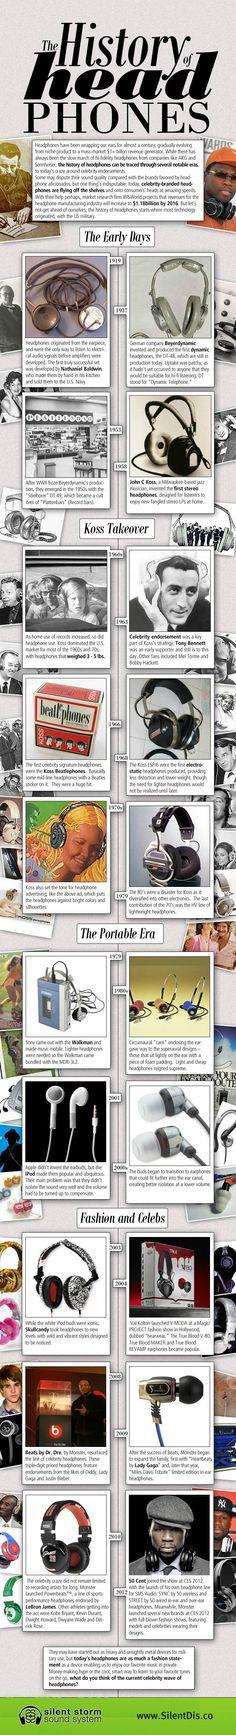 The History of Headphones | The Evolution of Headphones This Century